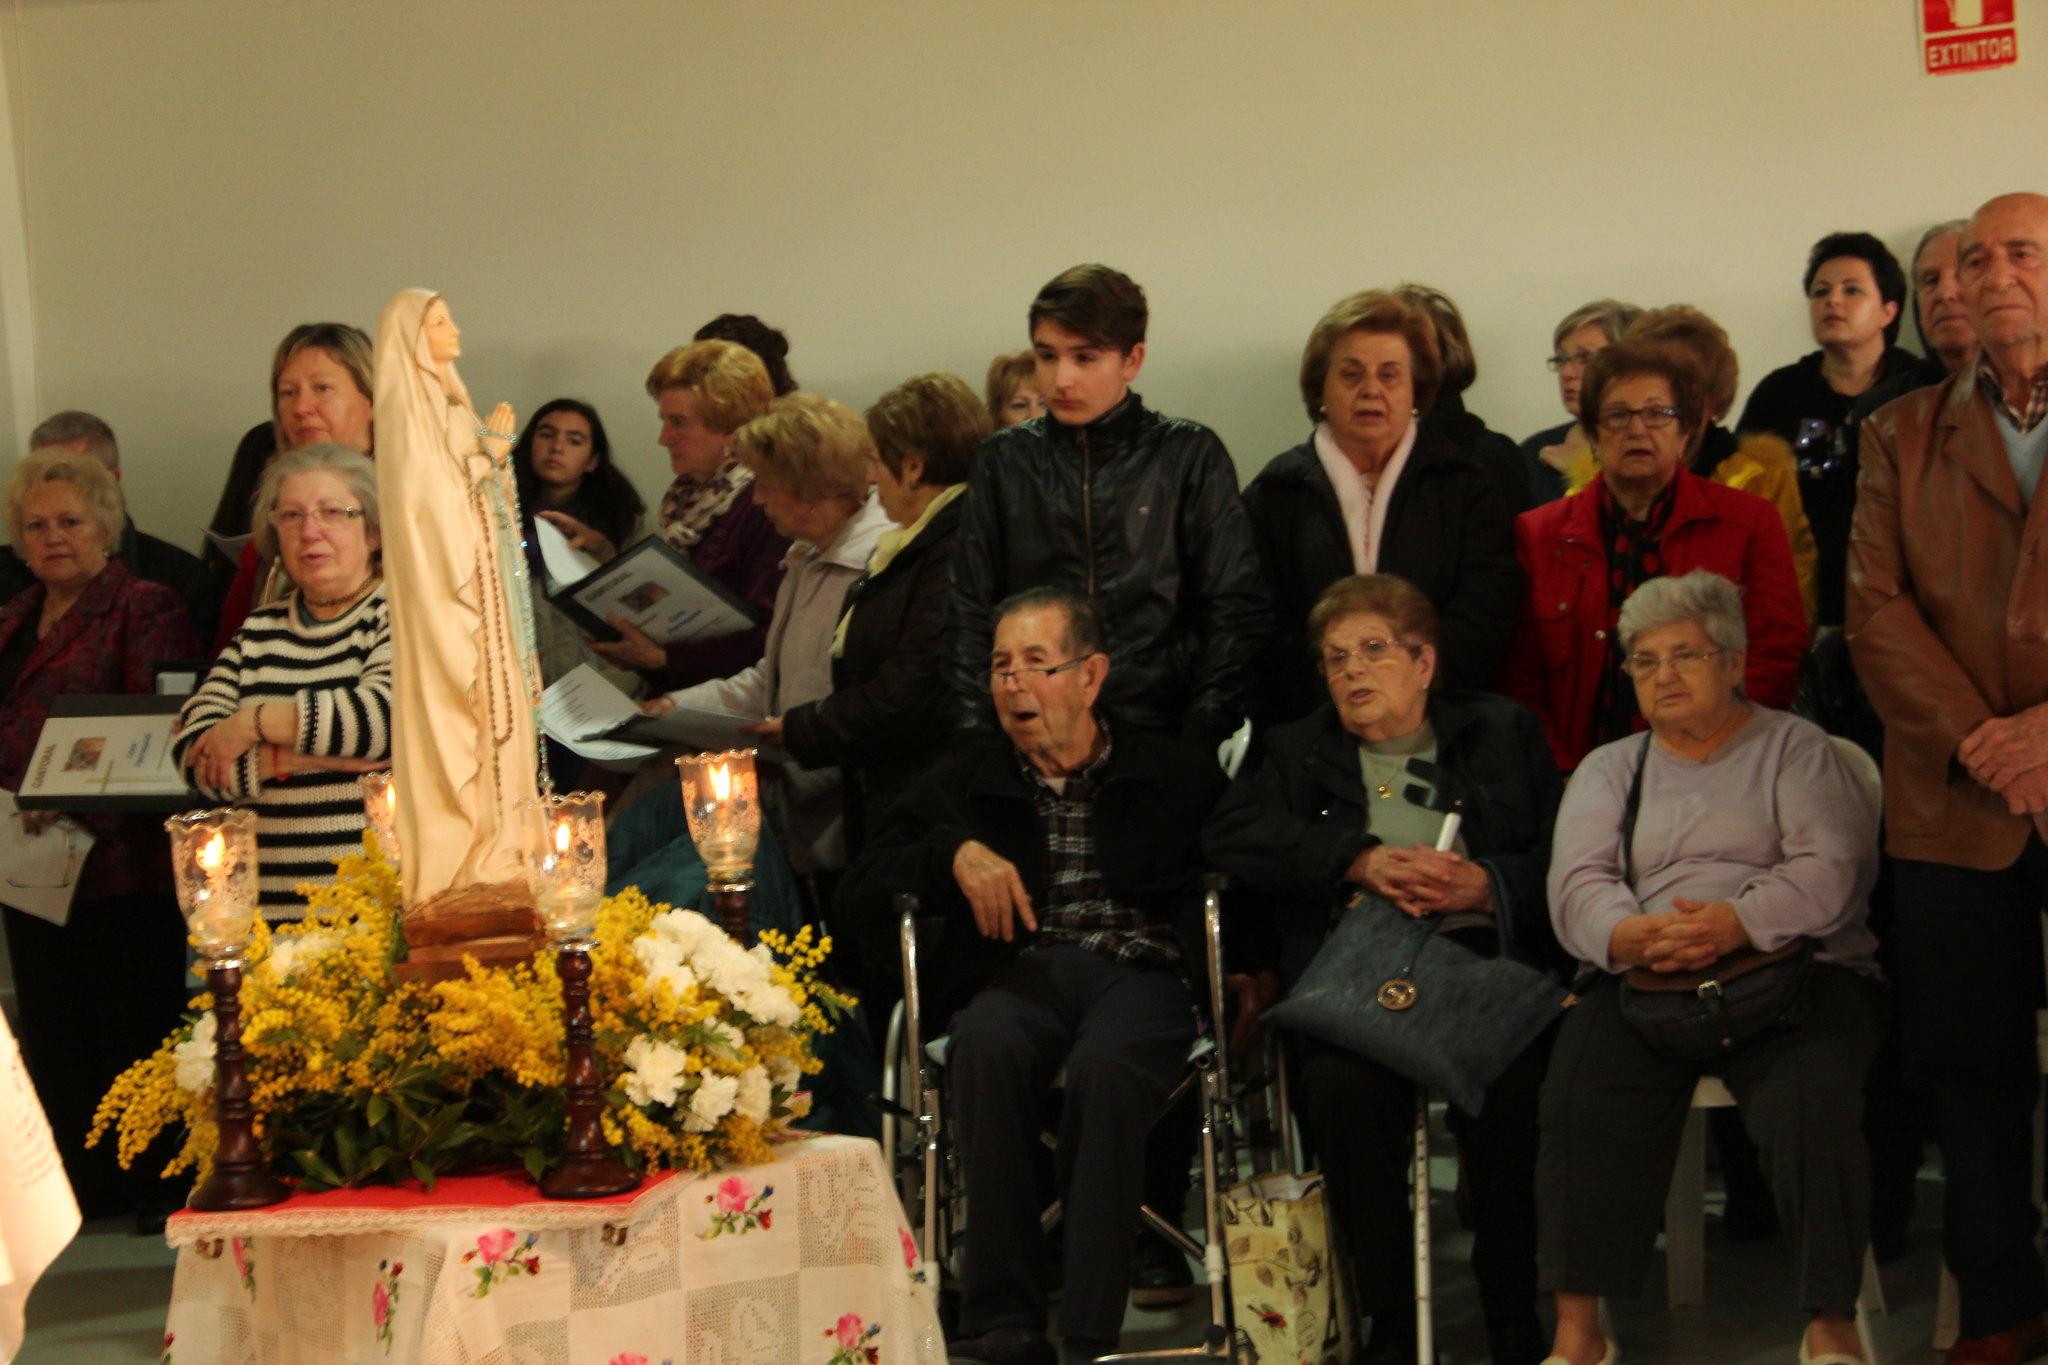 (2016-02-13) - Inauguración Virgen De Lourdes, La Molineta - Archivo La Molineta (043)